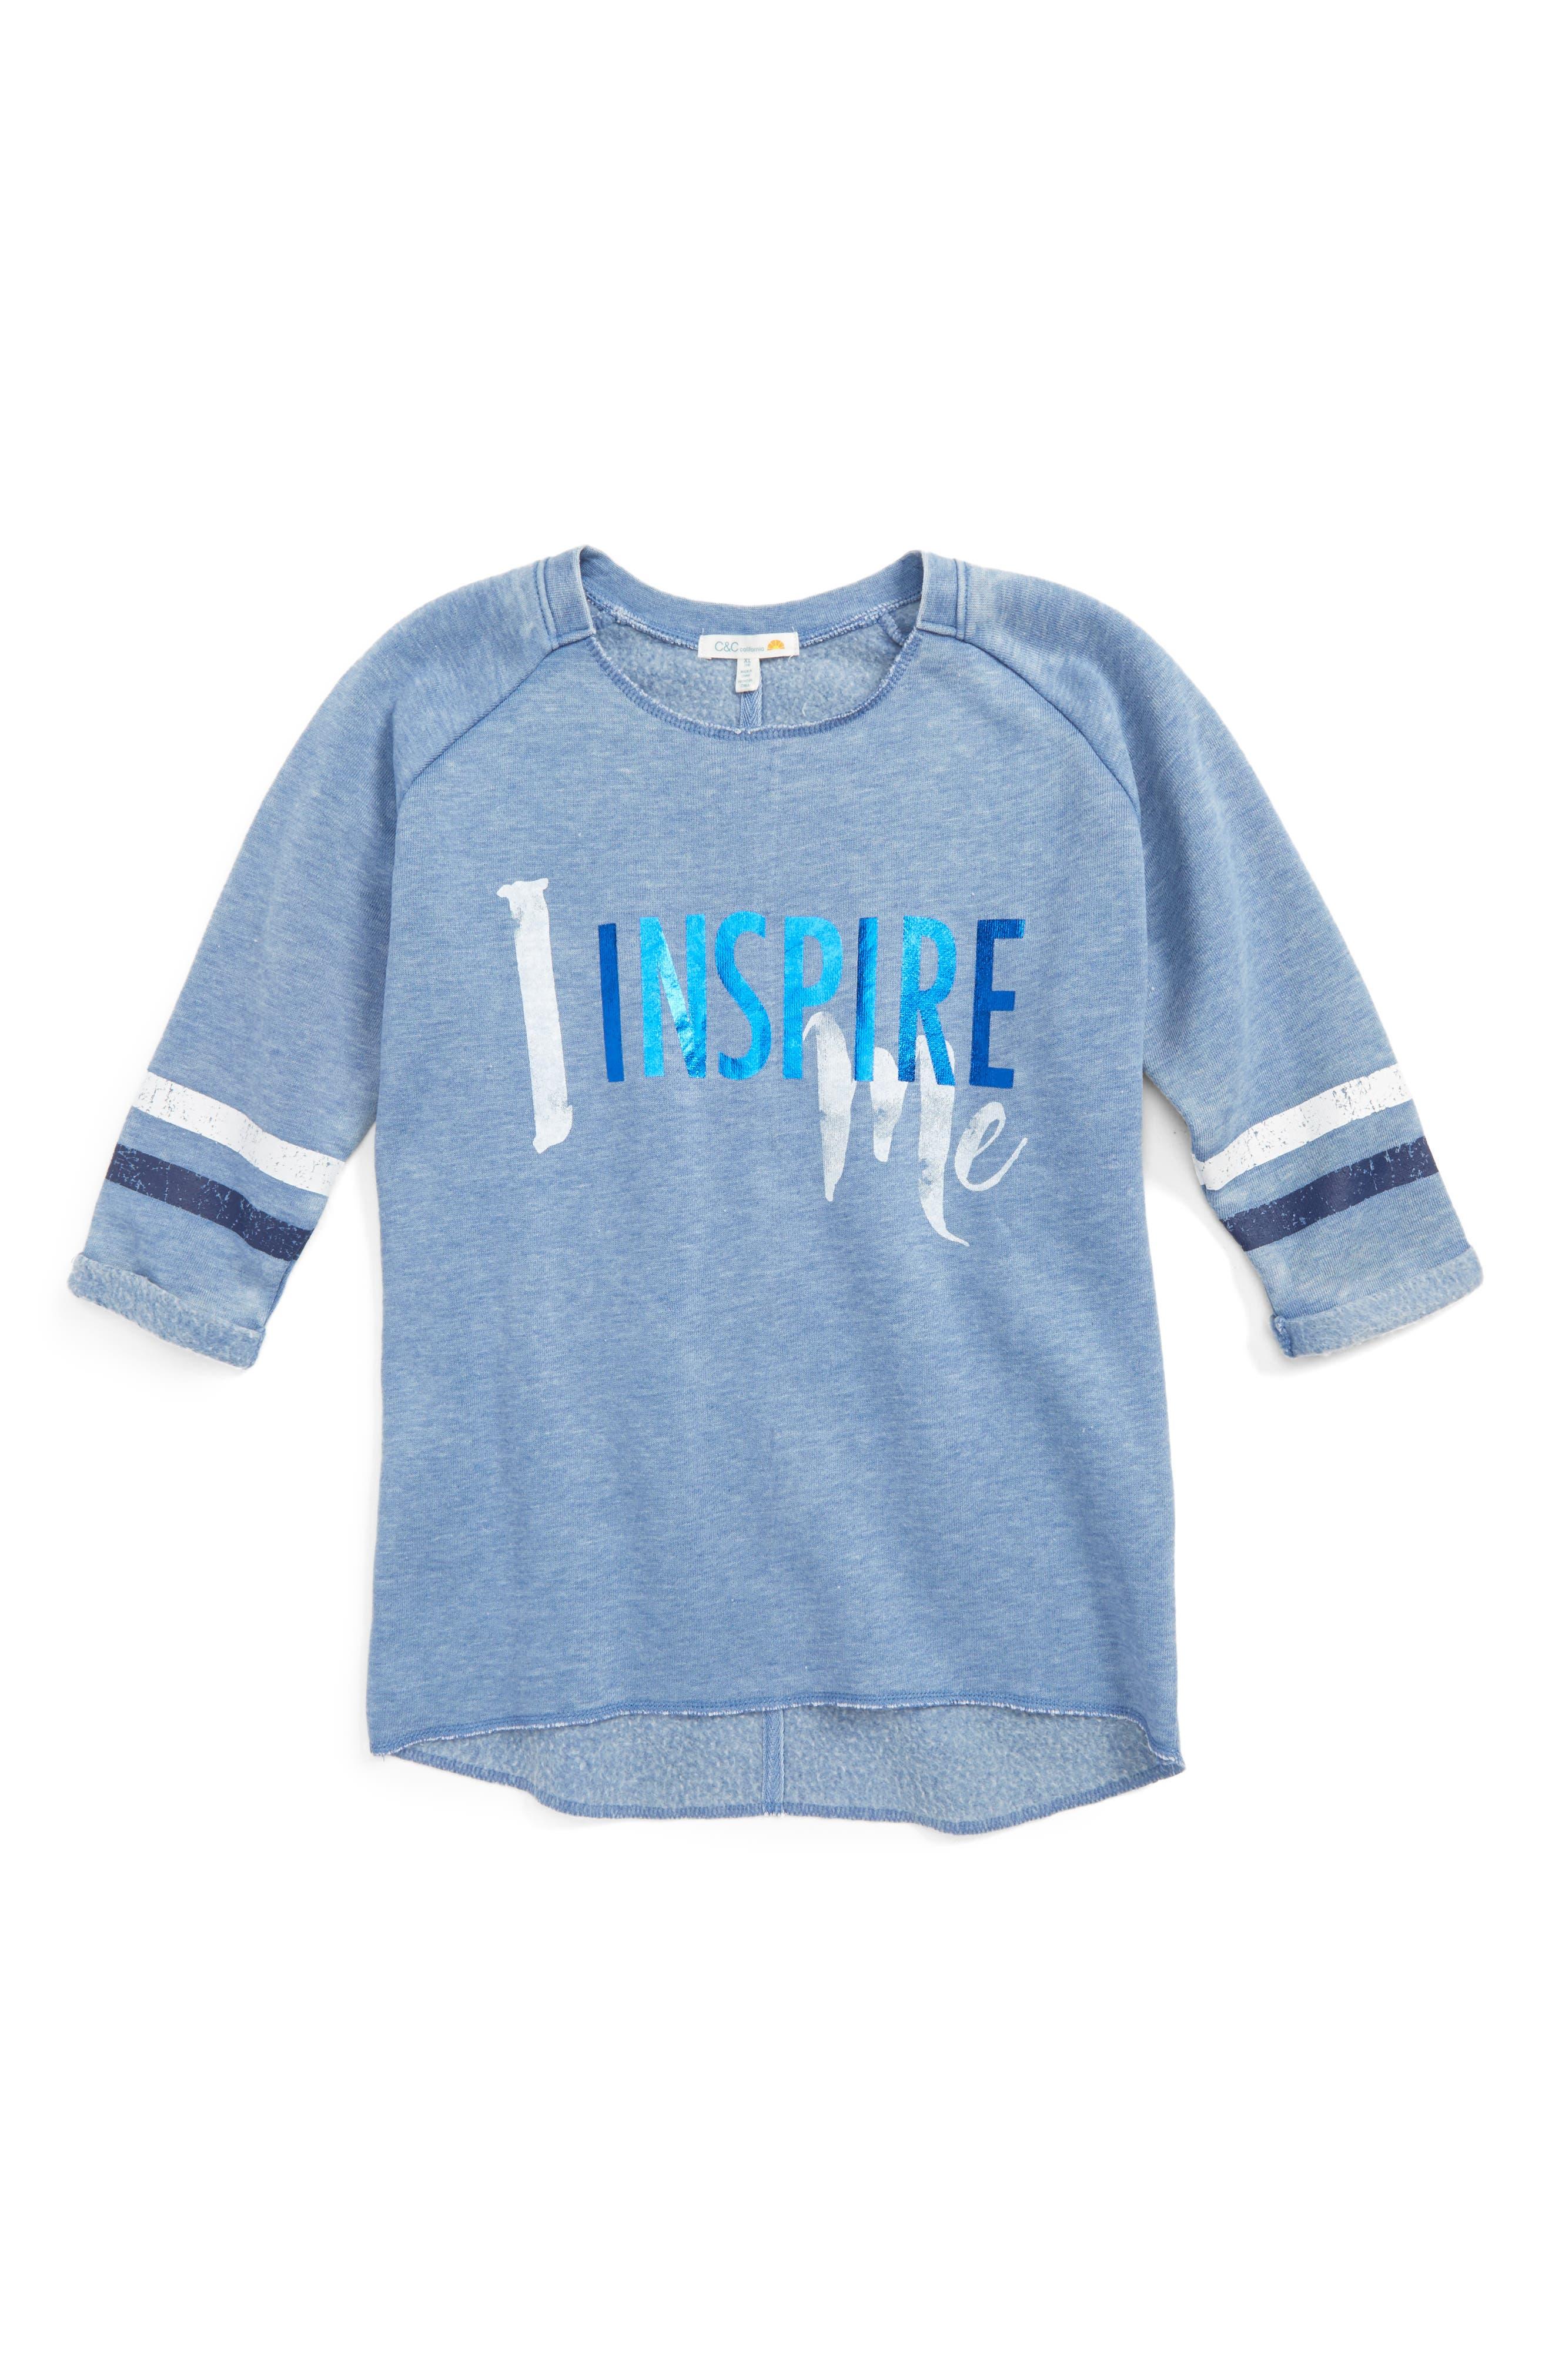 Alternate Image 1 Selected - C & C California Inspire Me Sweatshirt Tee (Big Girls)